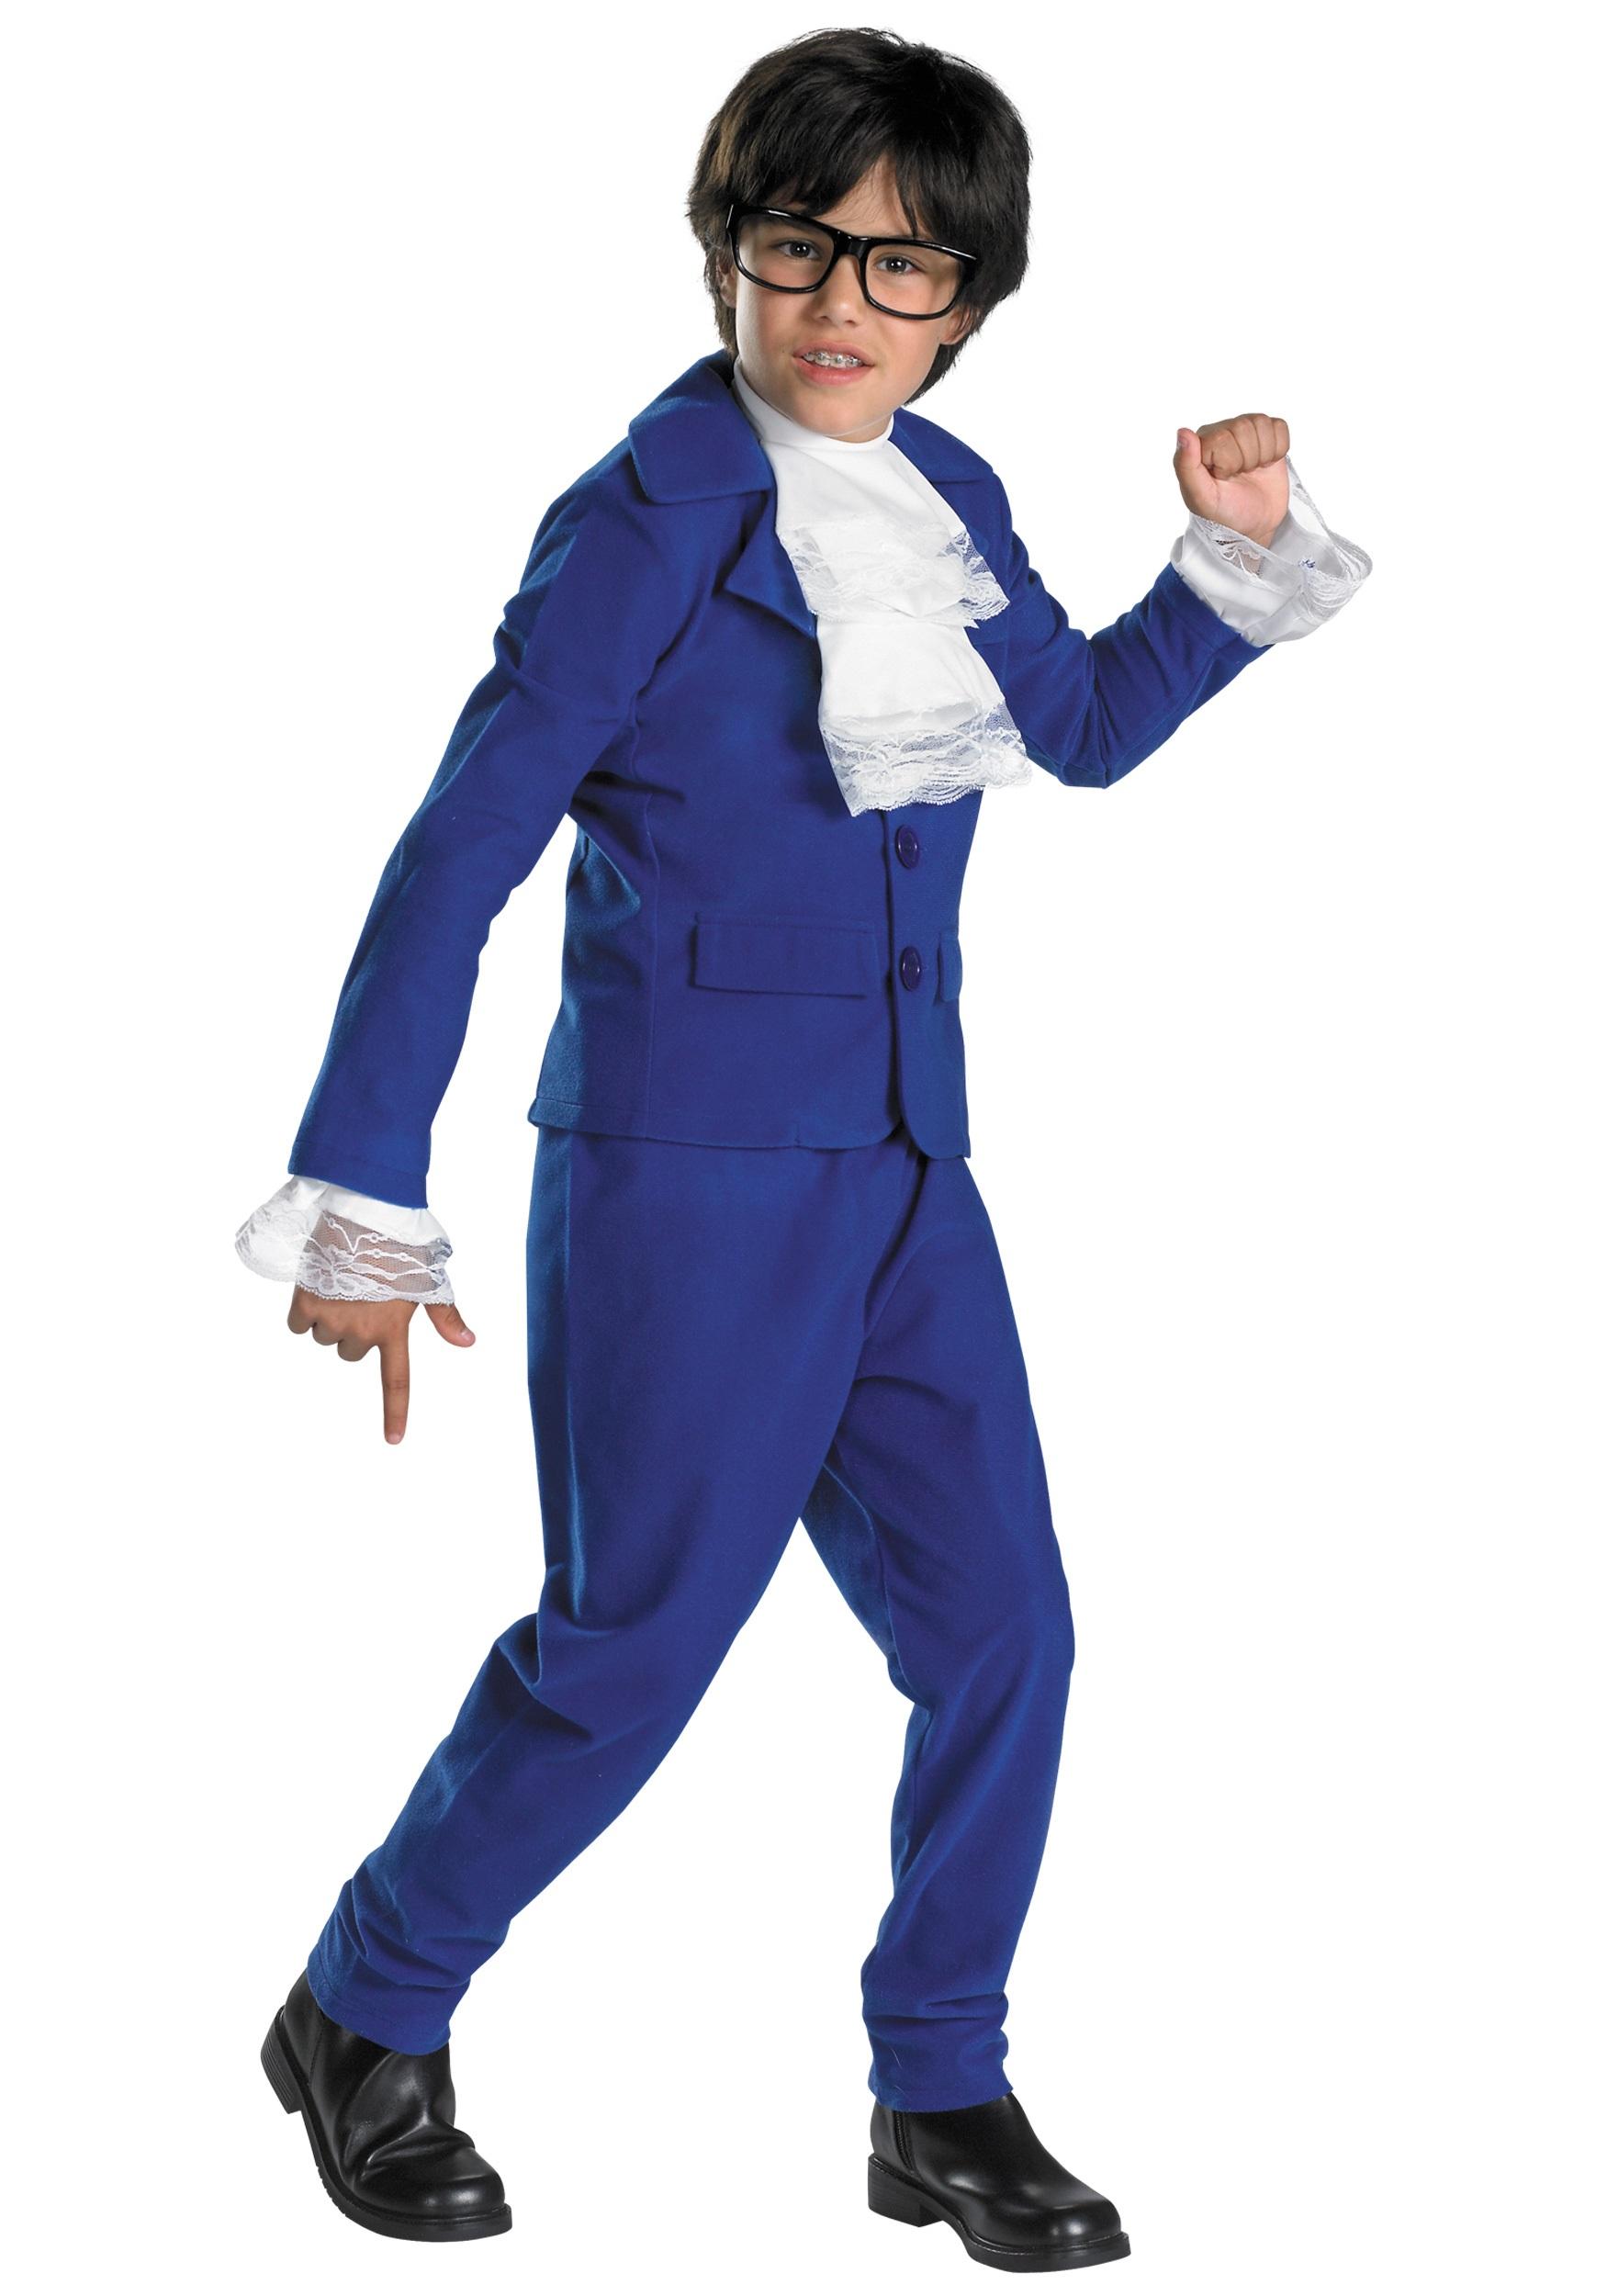 82de3bae331c boys-austin-powers-deluxe-costume.jpg